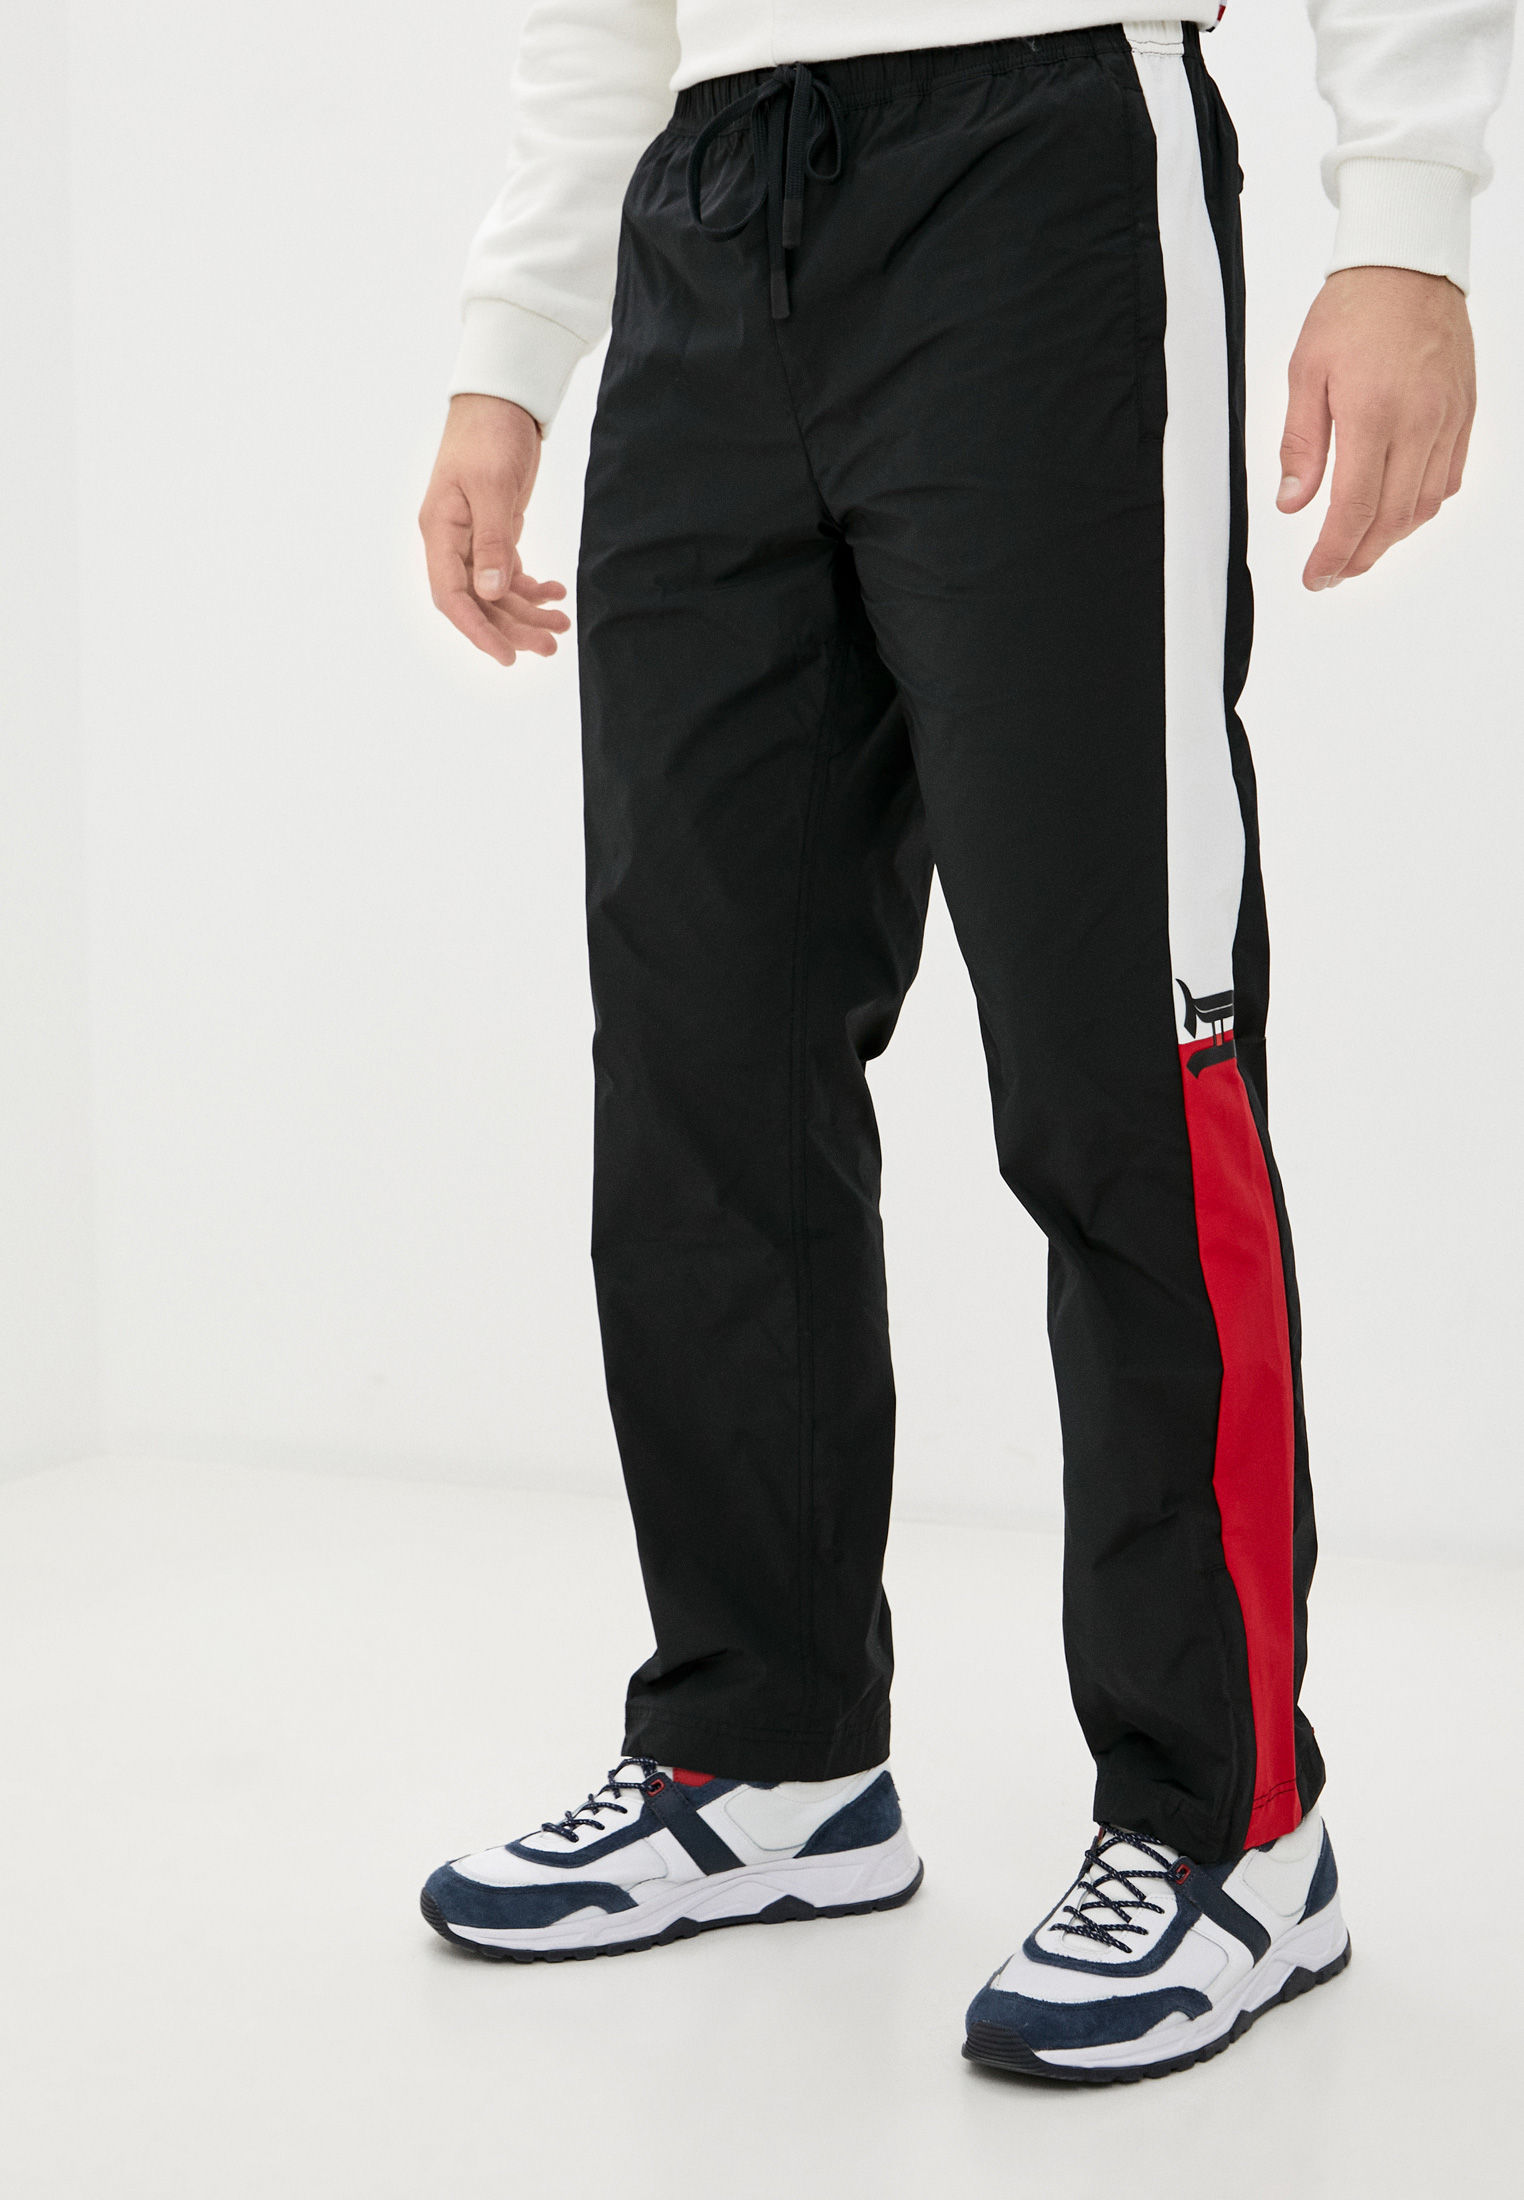 Мужские спортивные брюки Tommy Hilfiger (Томми Хилфигер) MW0MW15407